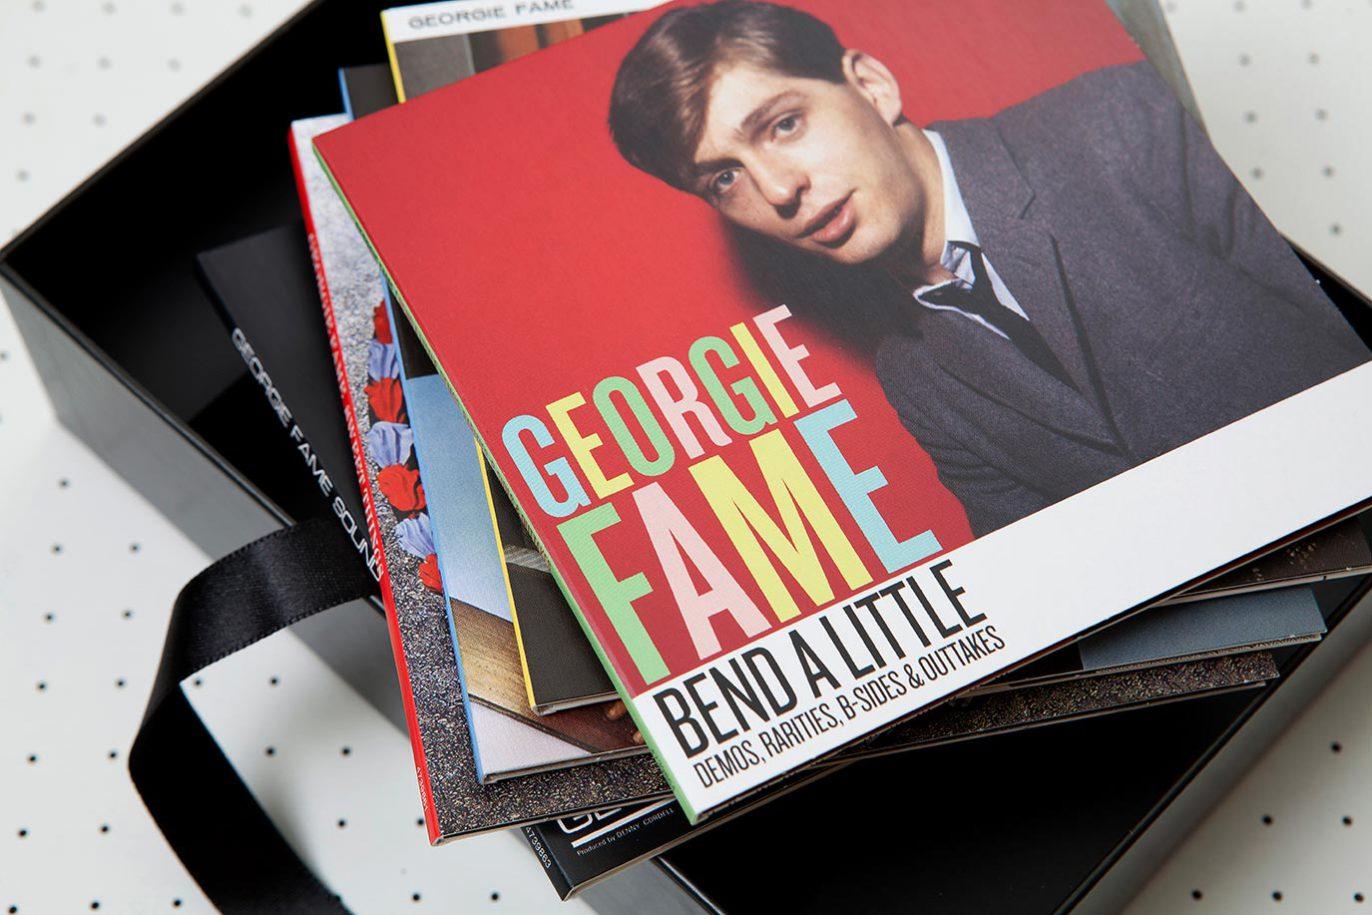 georgie-fame_box-02